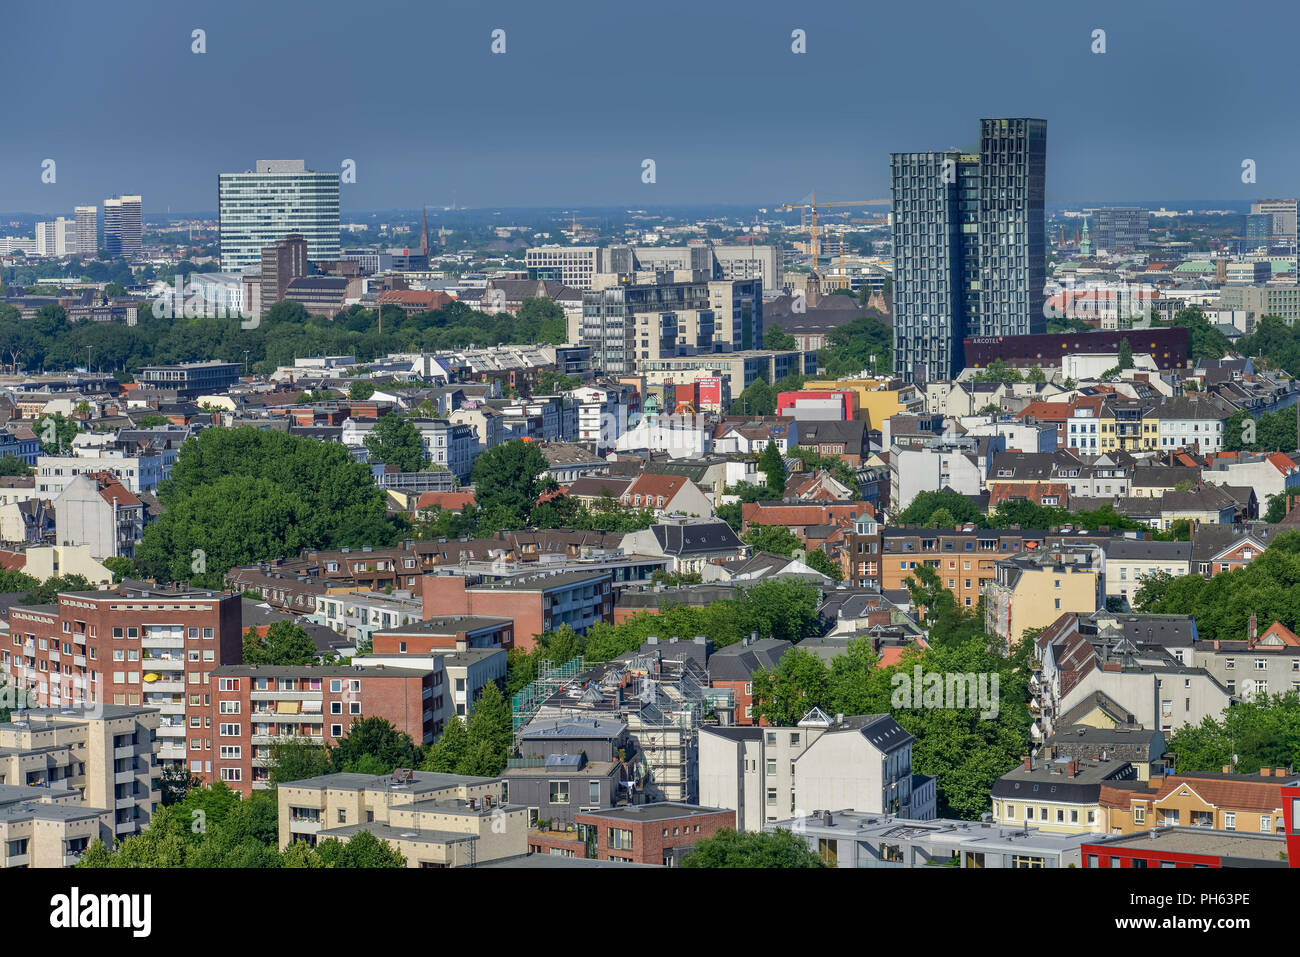 Luftbild, St. Pauli, Hamburg - Stock Image